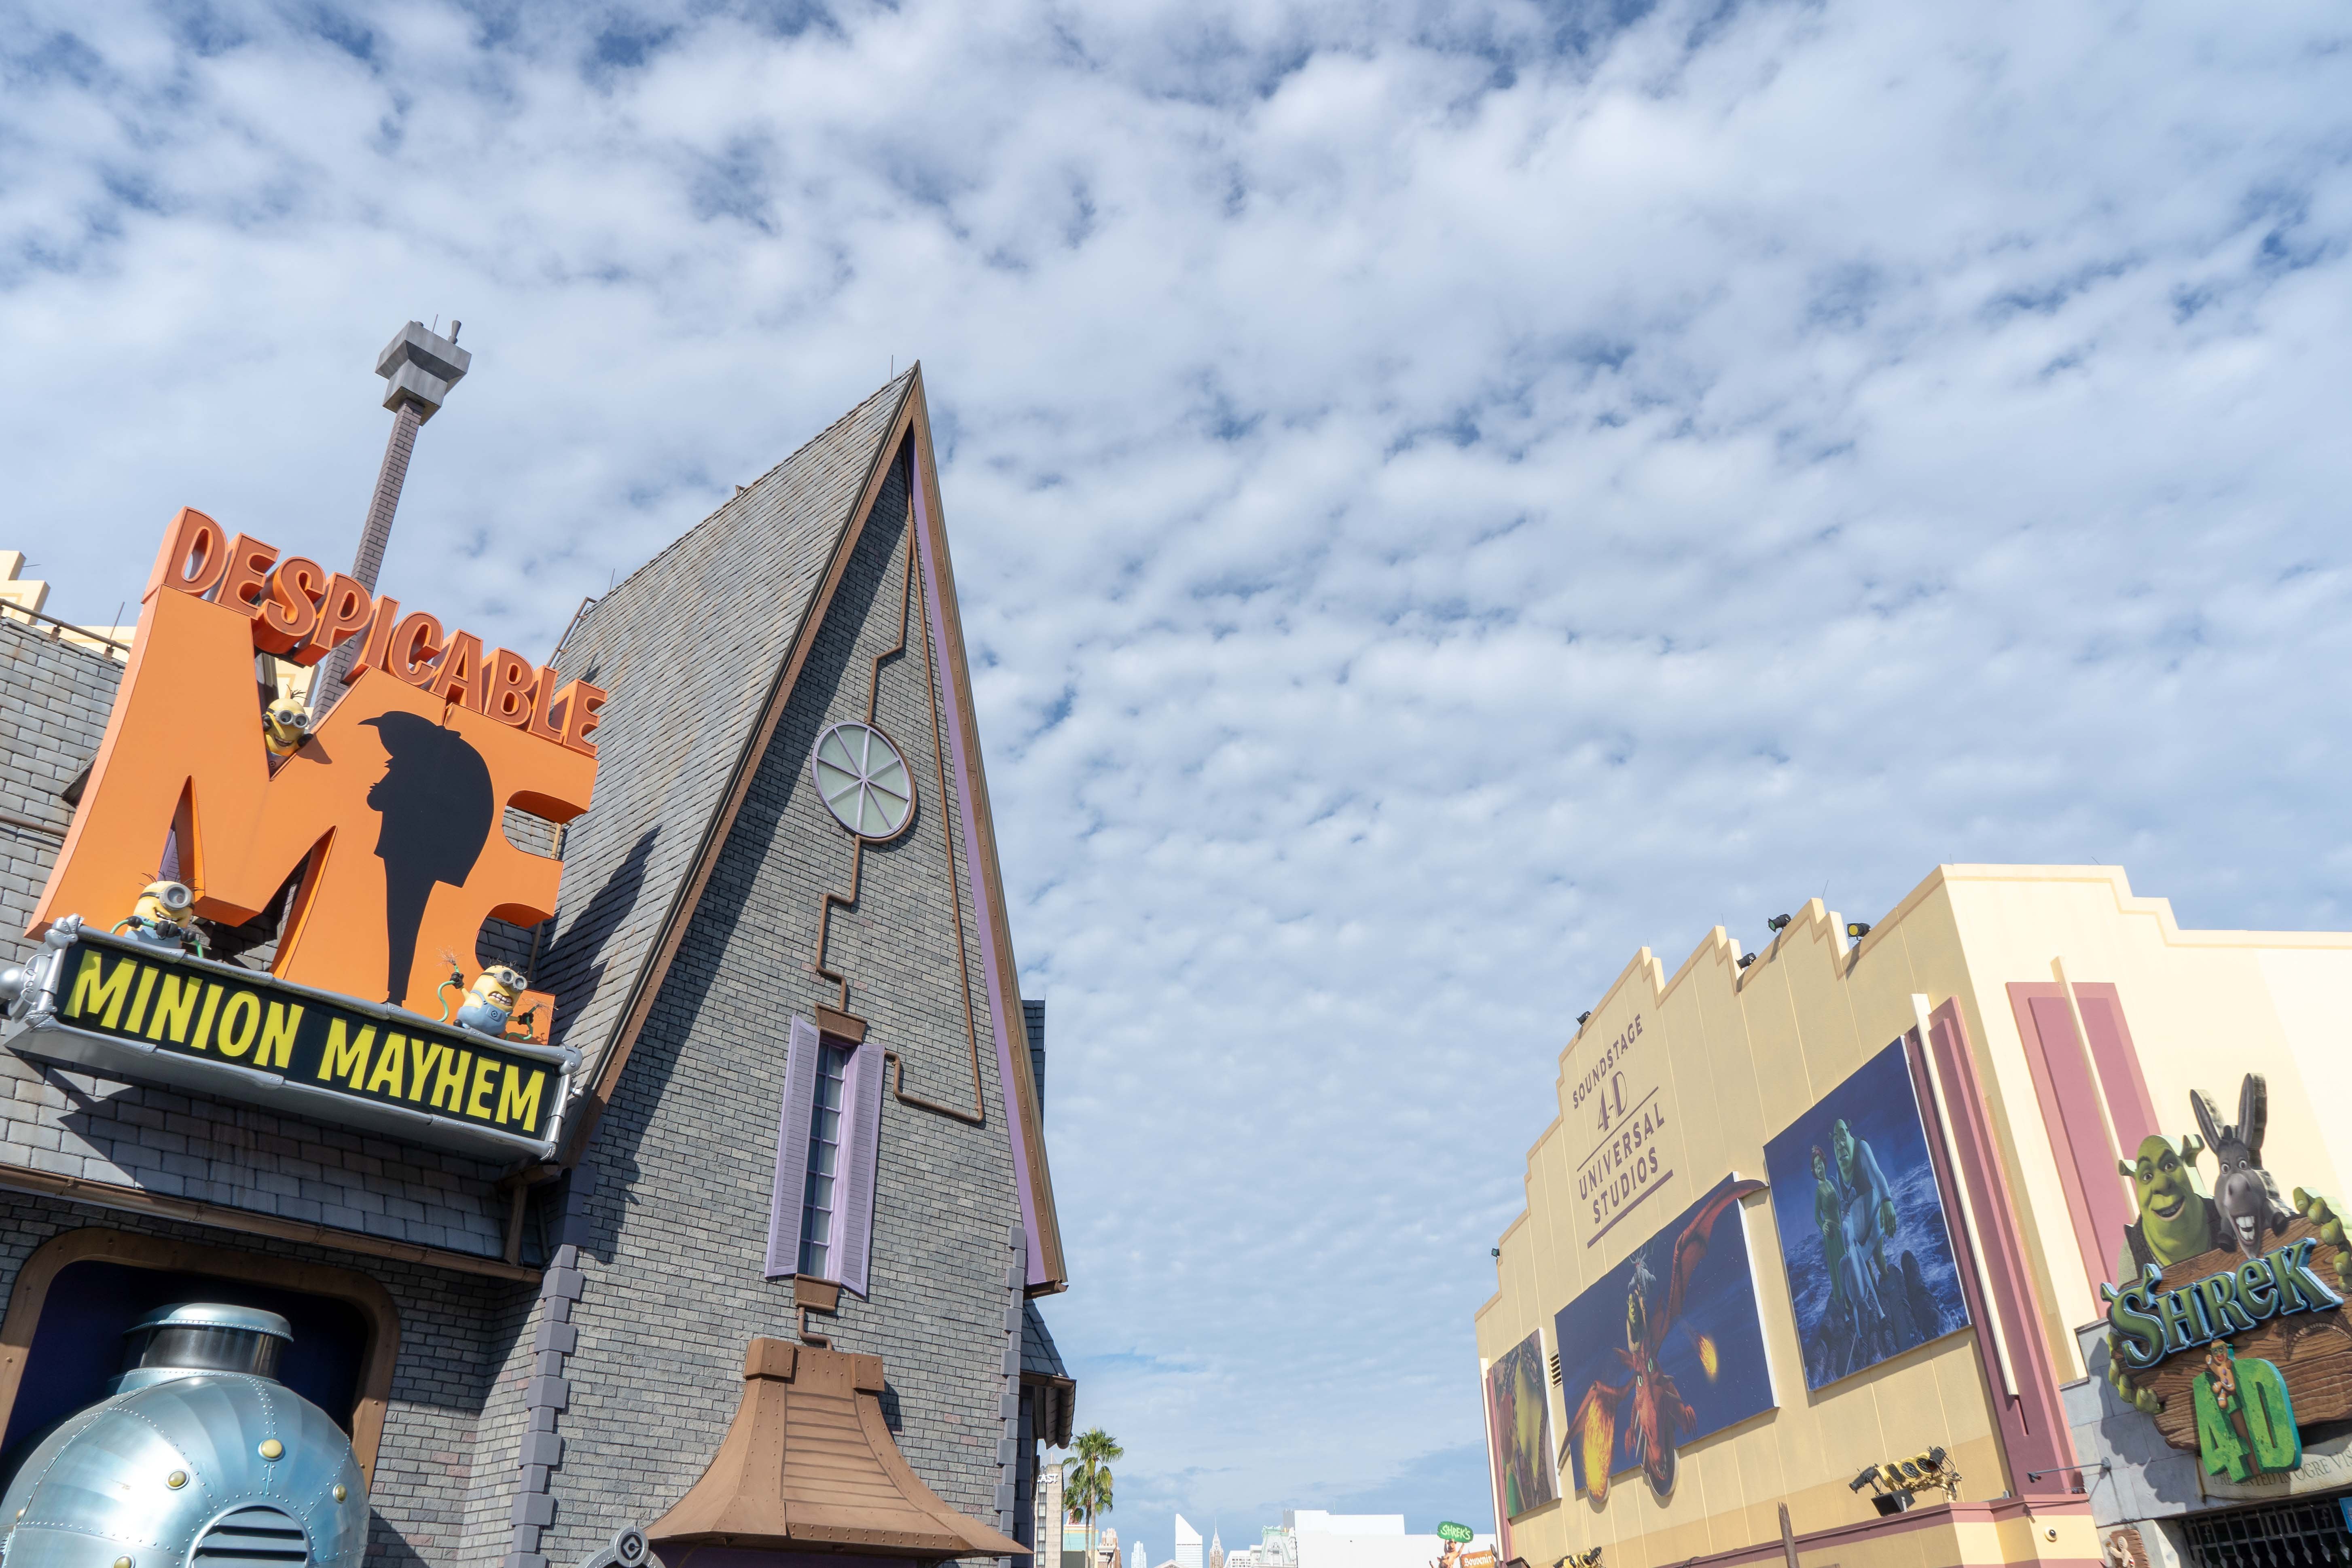 Despicable Me Minion Mayhem Universal Studios Florida Odysight